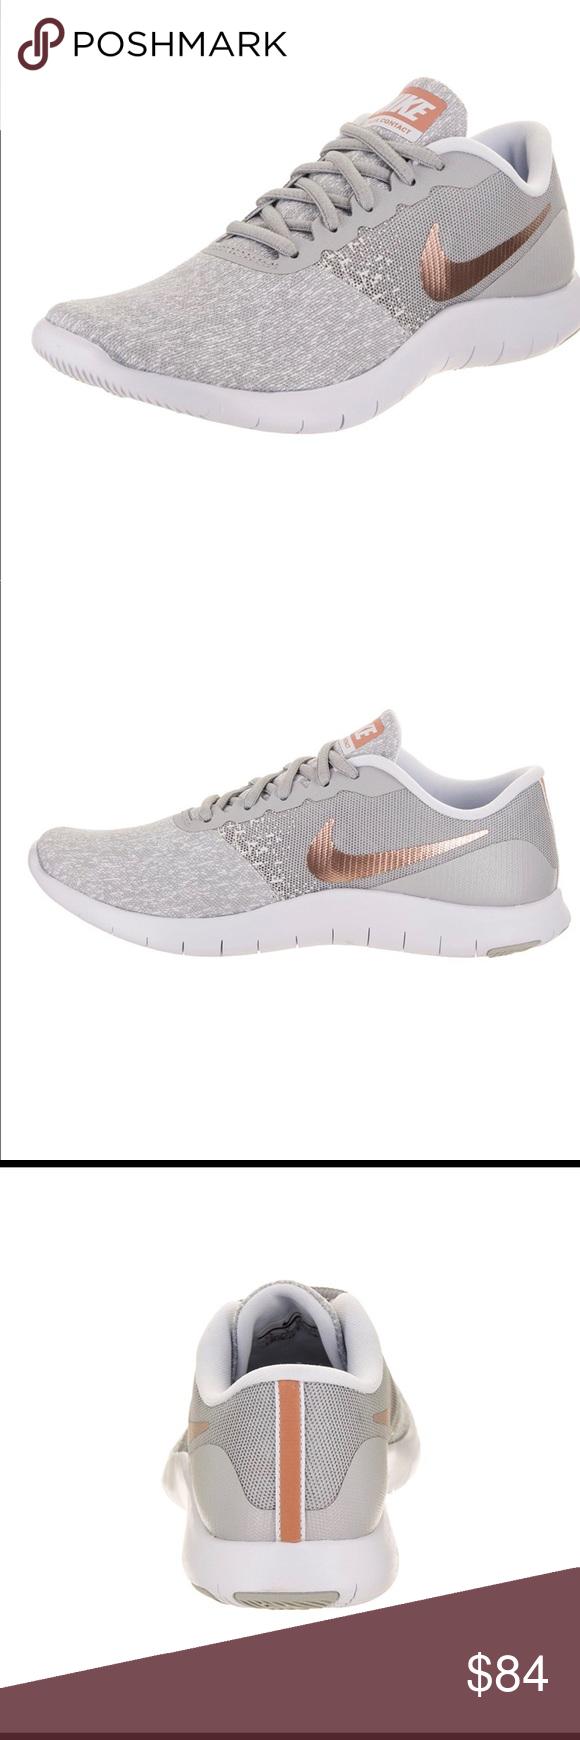 6d3cca598a6 Nike Womens Flex Contact Rose Gold Grey